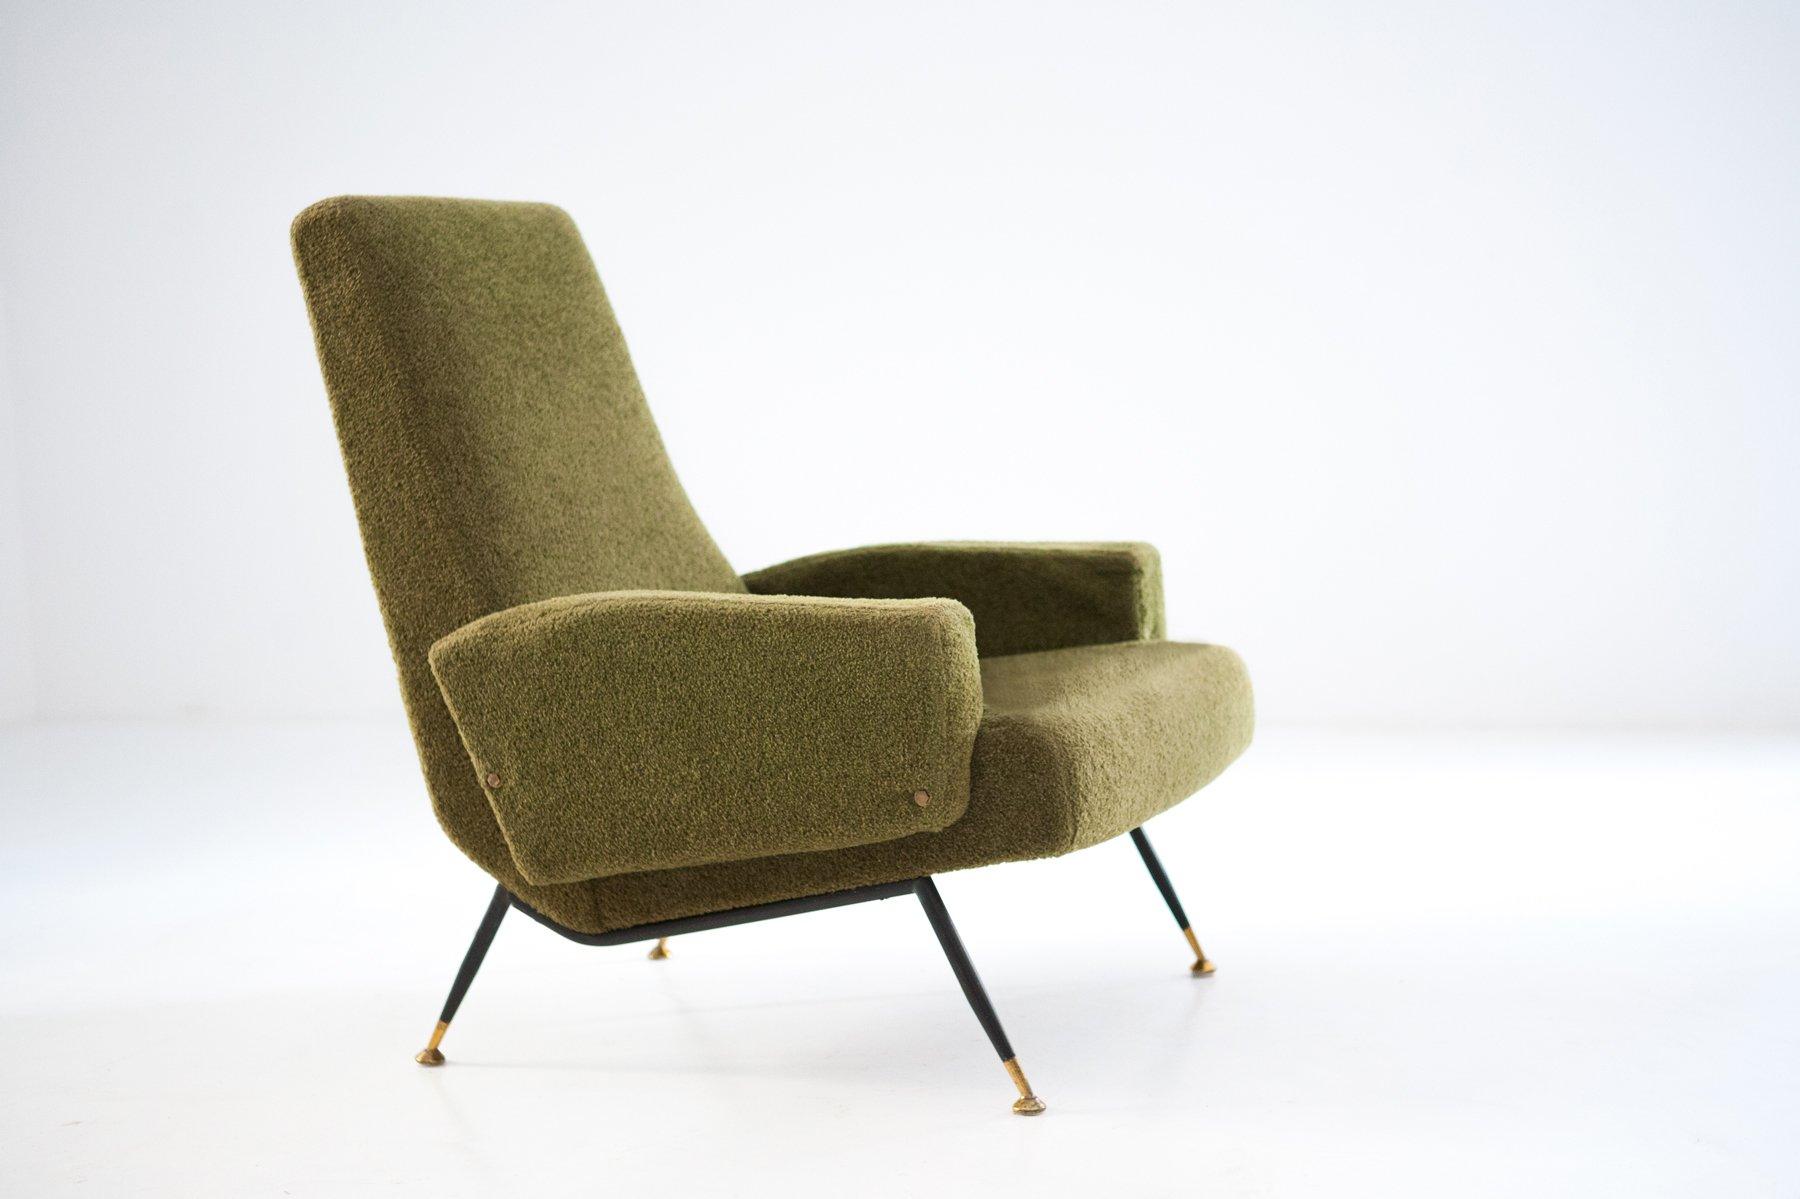 italienischer mid century sessel 1950er bei pamono kaufen. Black Bedroom Furniture Sets. Home Design Ideas